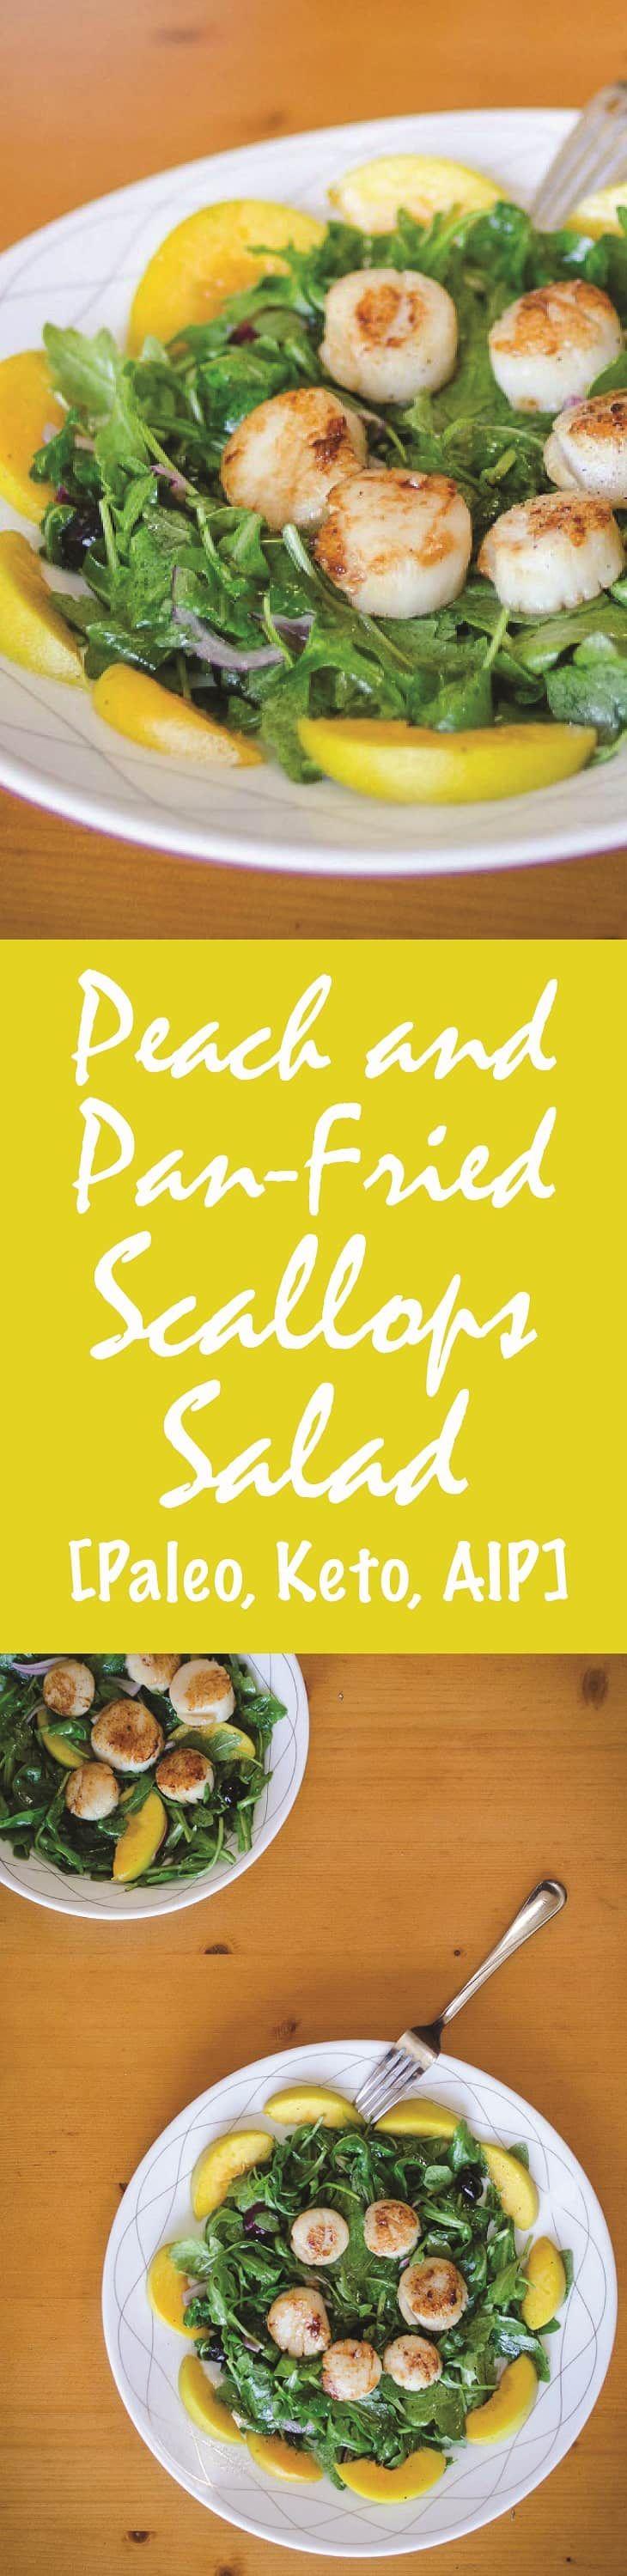 Peach and Pan-Fried Scallops Salad Recipe [Paleo, Keto, AIP] #paleo #keto #aip #recipes - http://paleomagazine.com/peach-pan-fried-scallops-salad-recipe